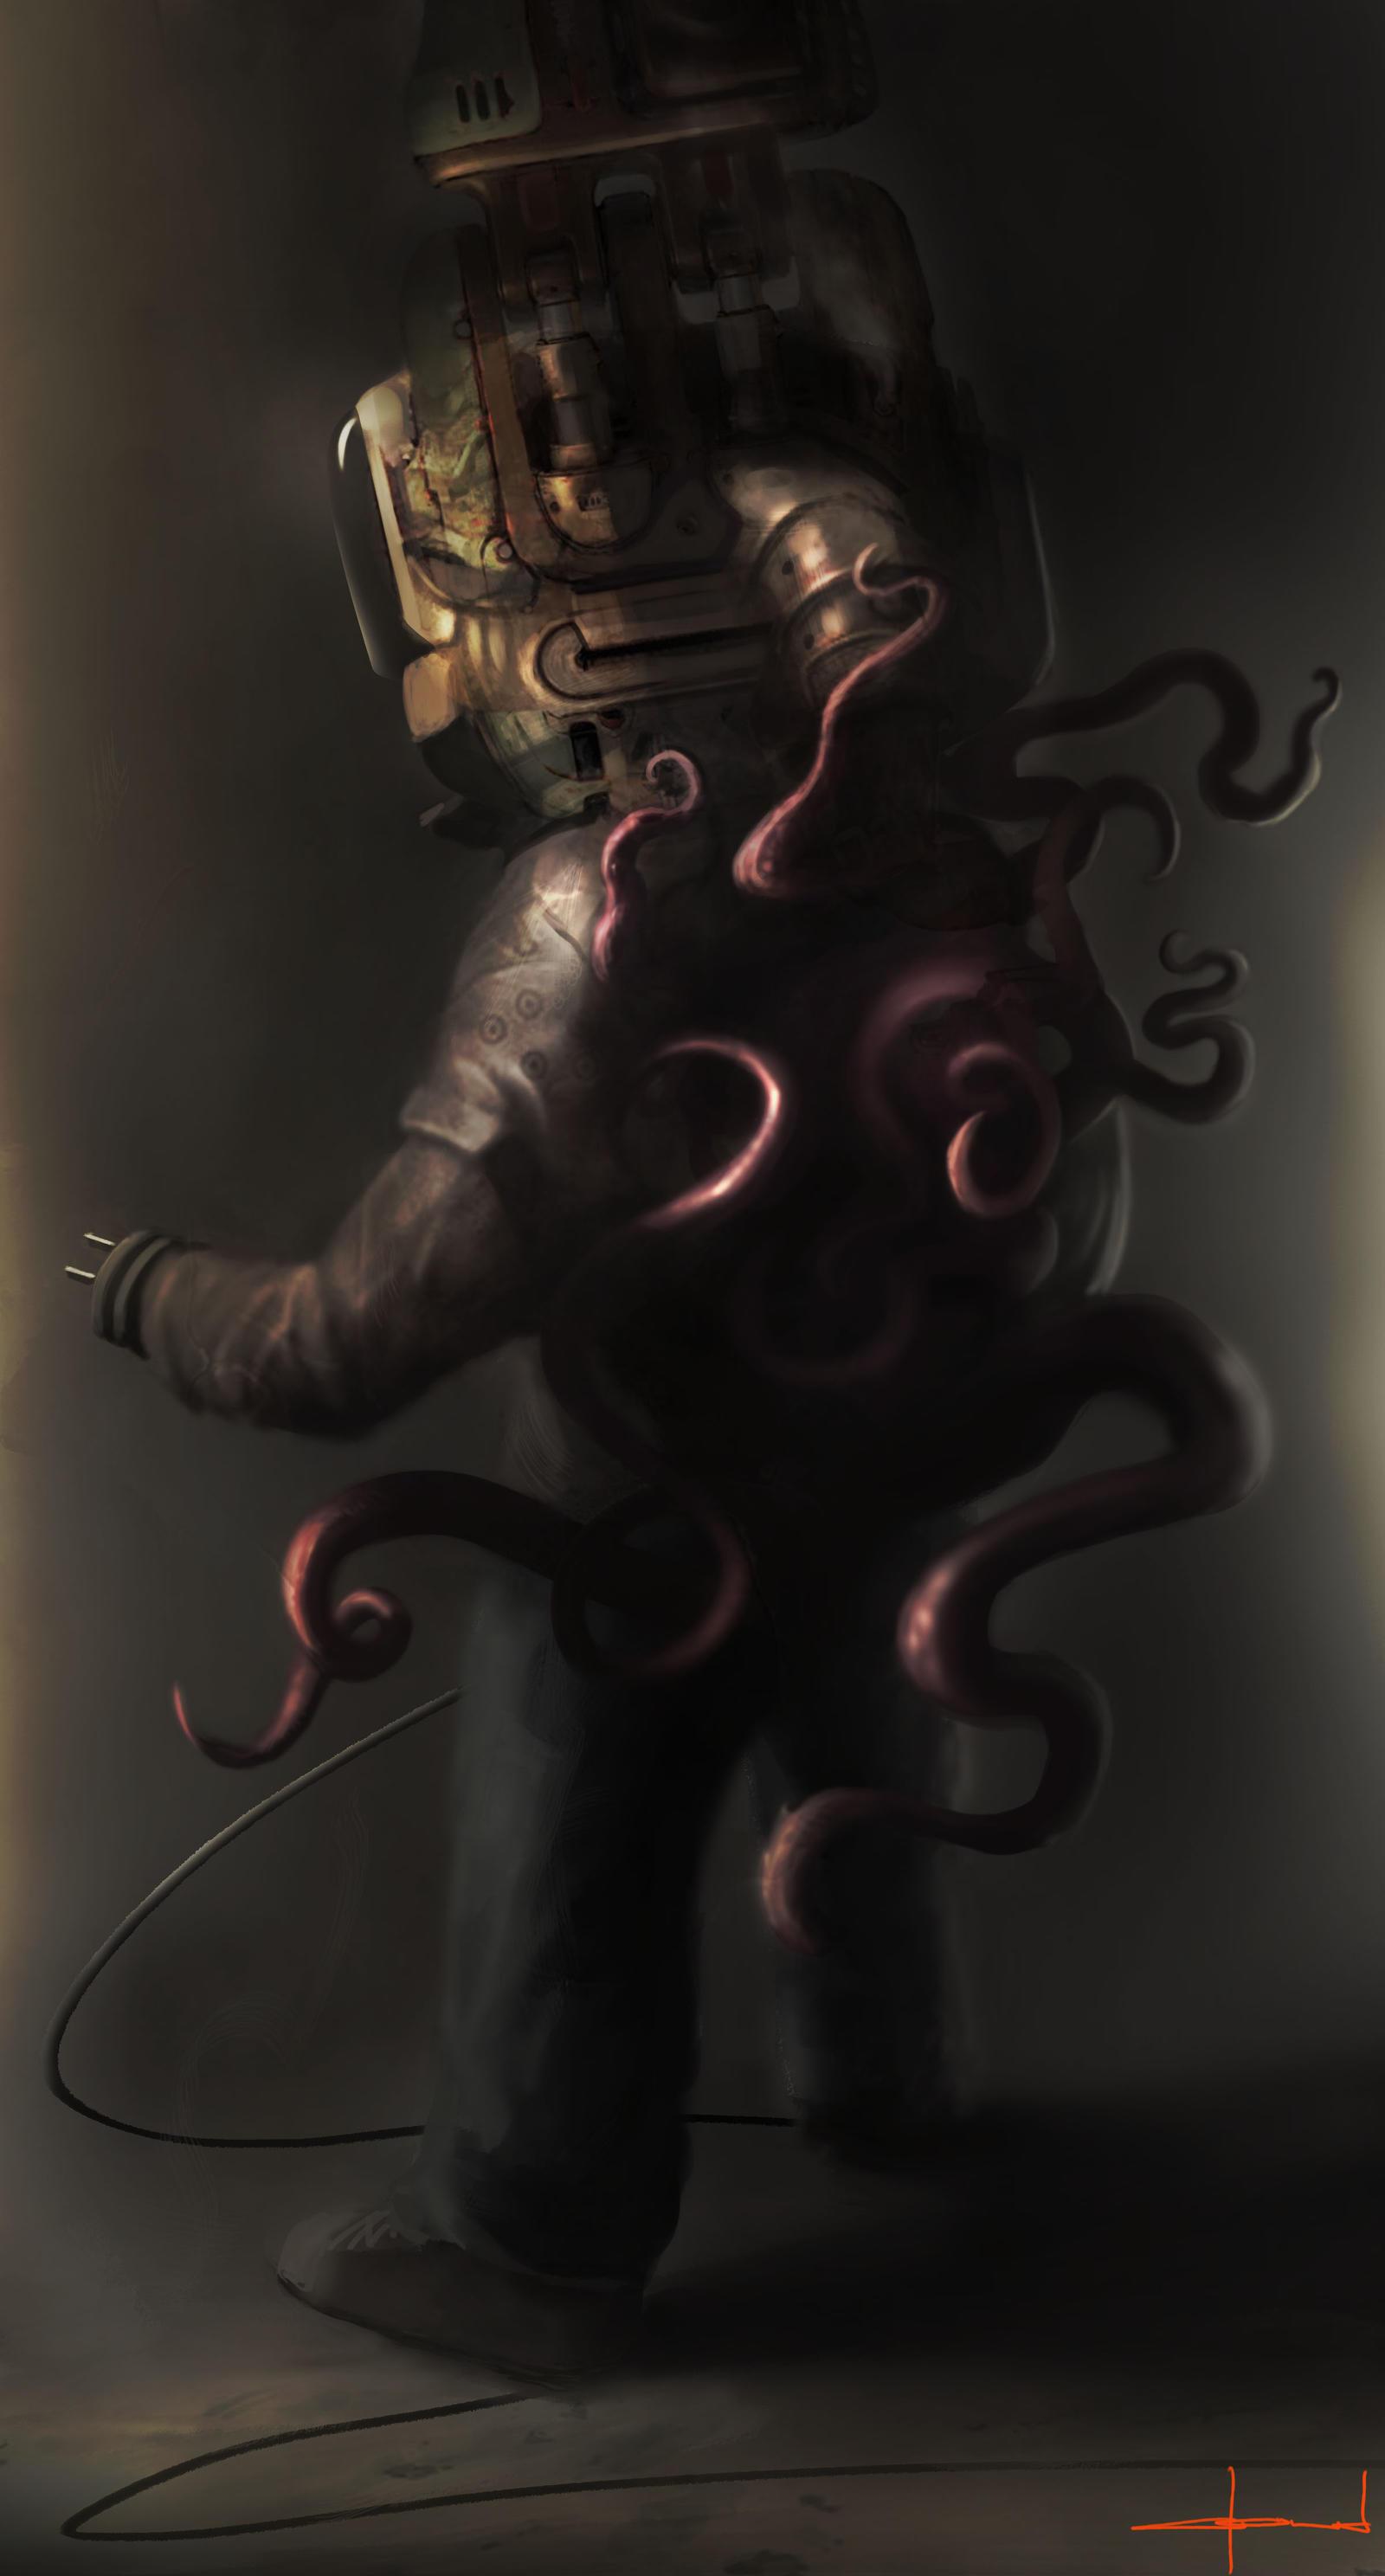 Machine Head by Darkcloud013